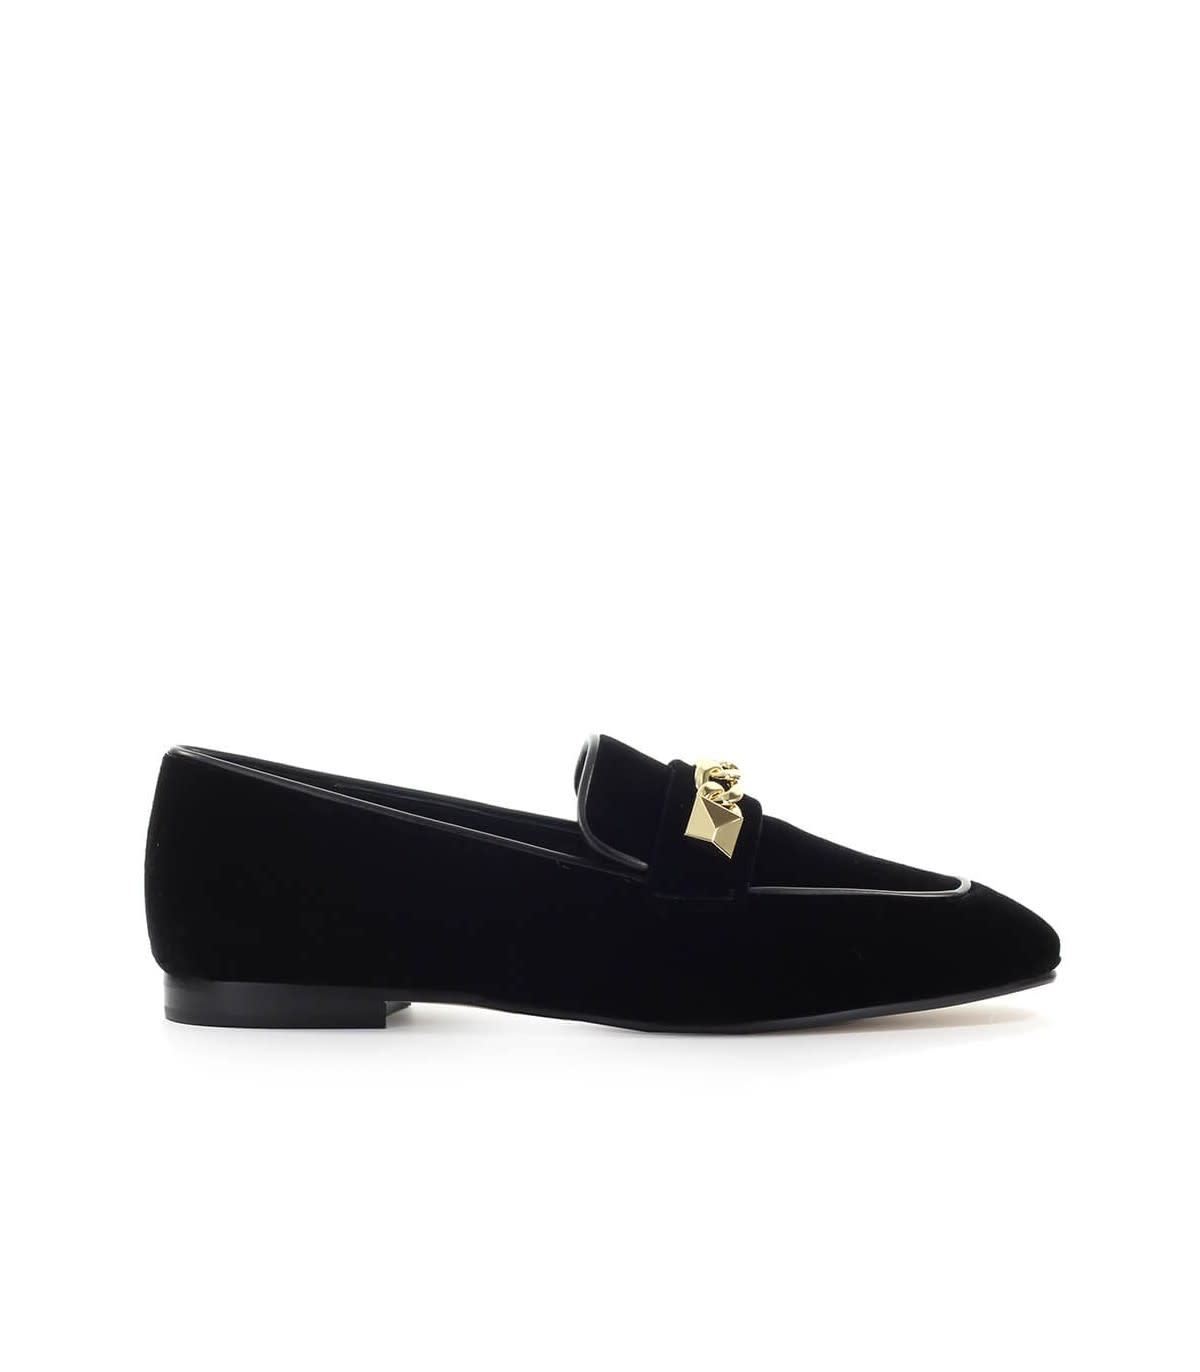 Photo of Michael Kors Galloway Balck Velvet Loafer - shop Michael Kors clothing 100% sales